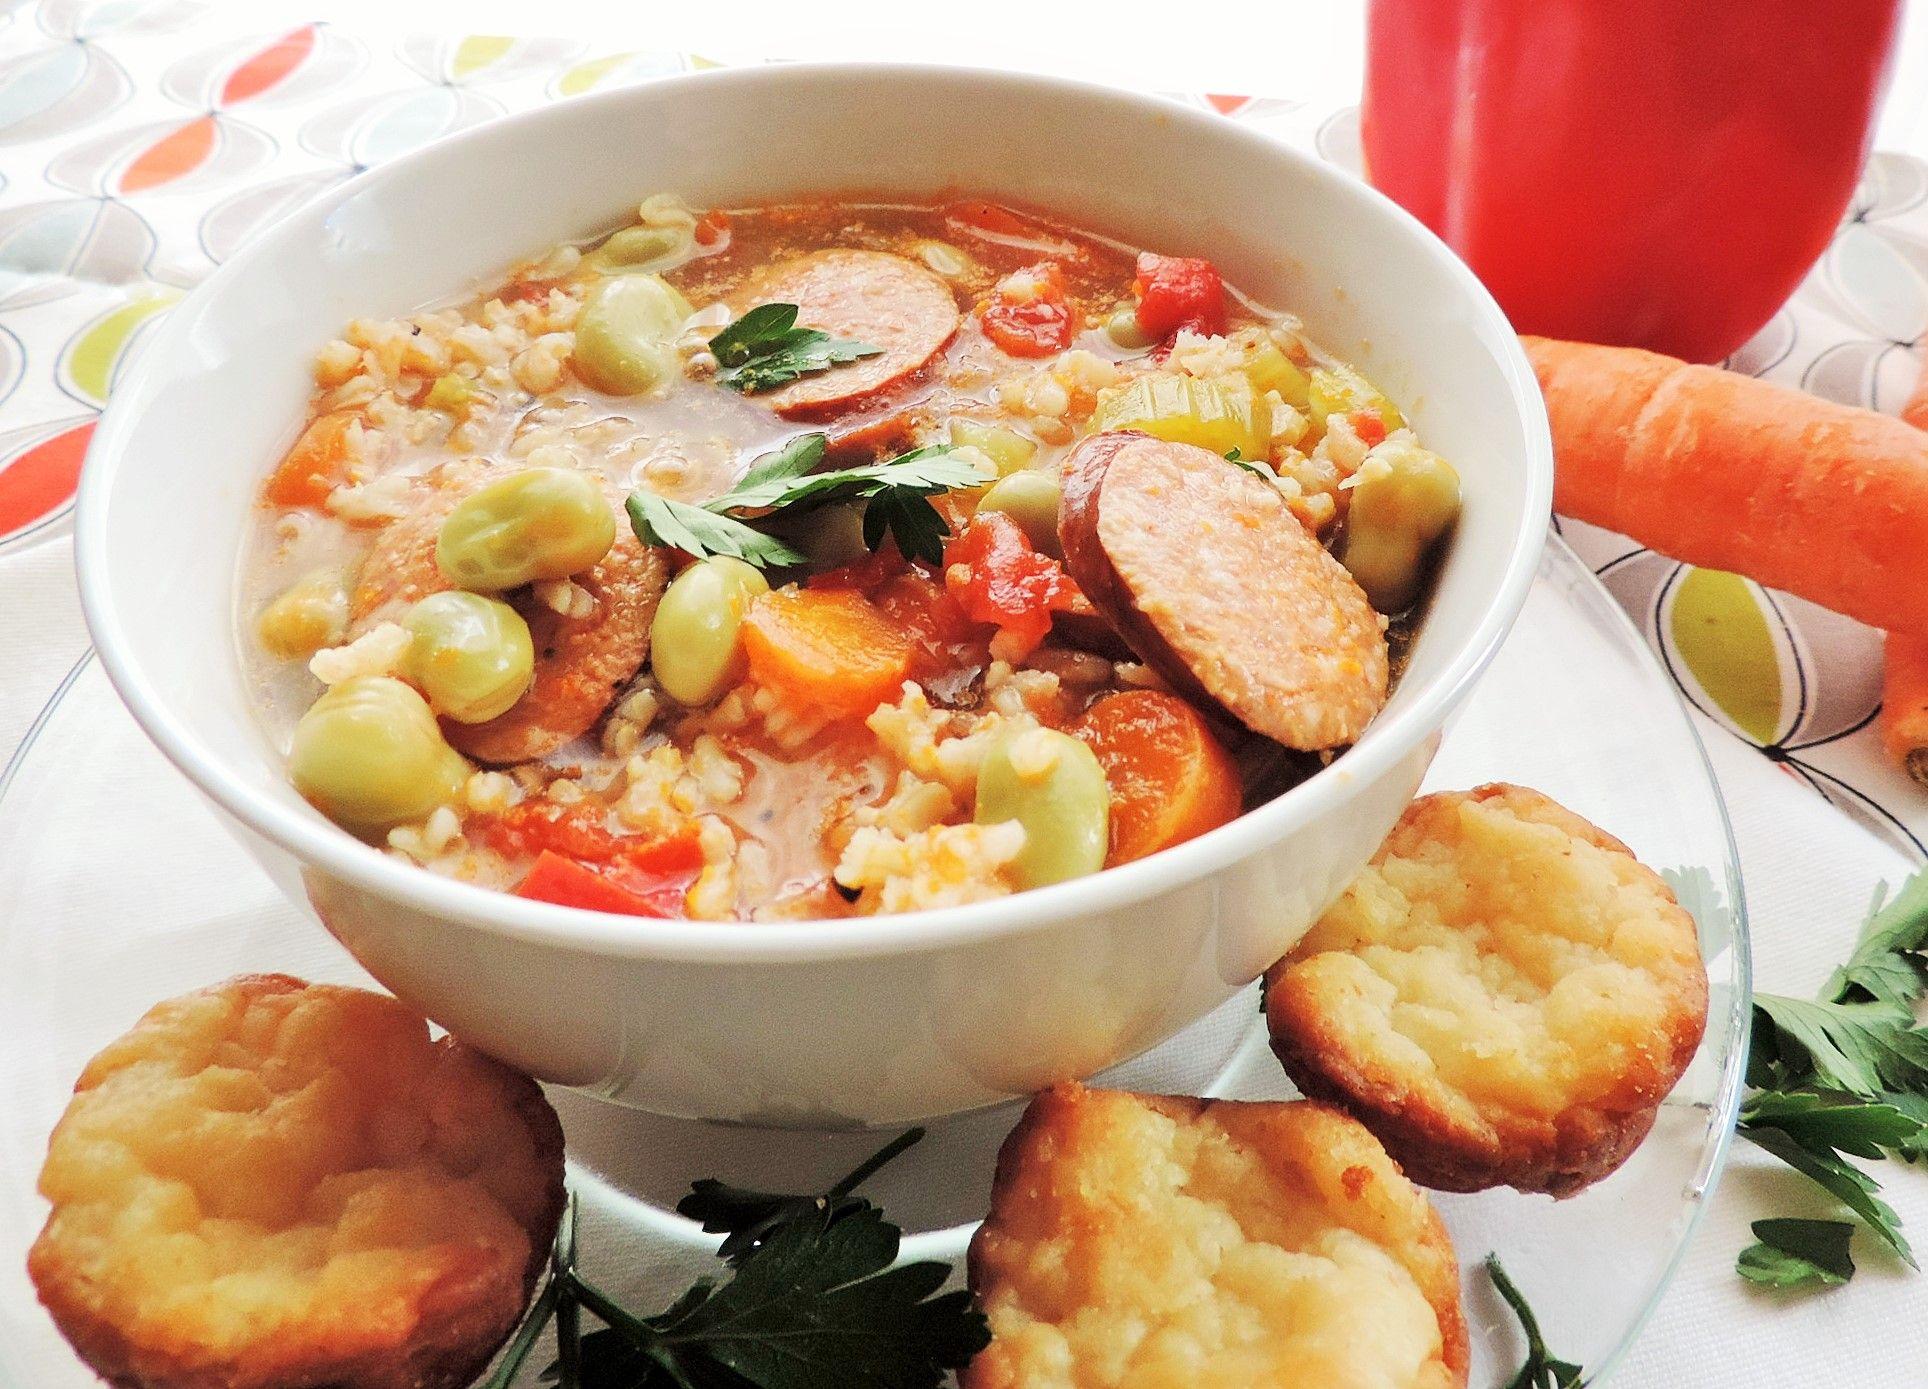 Crock Pot Gumbo - Powered by @ultimaterecipe #crockpotgumbo